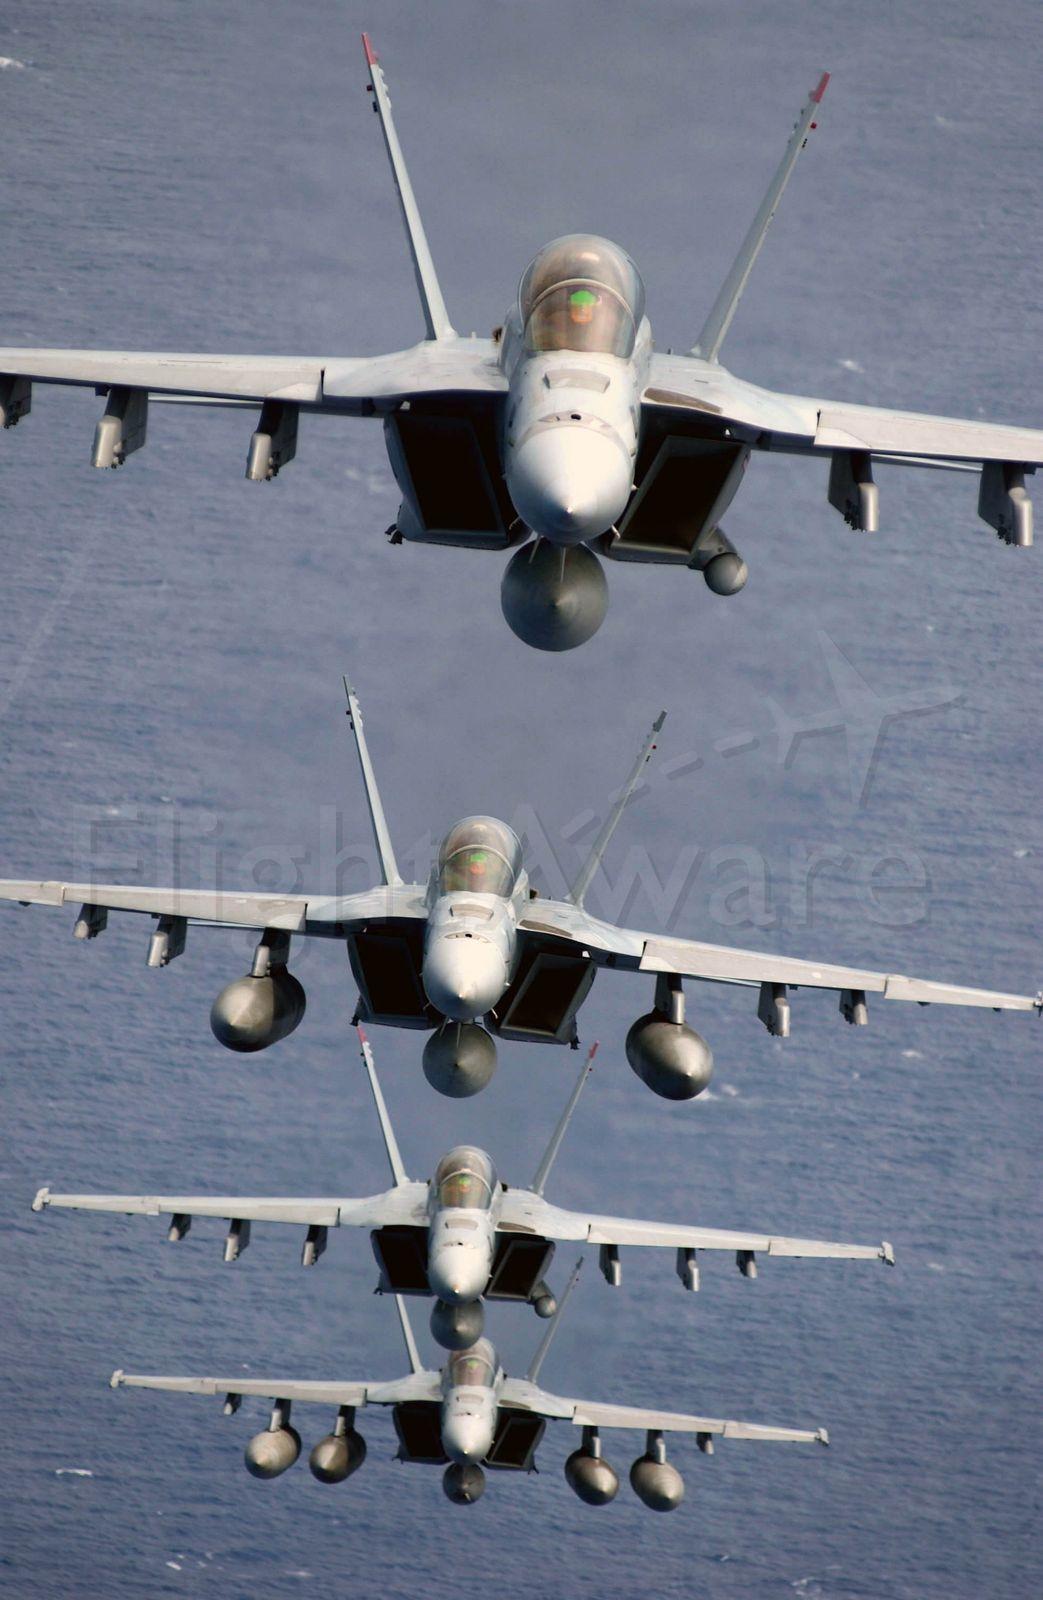 McDonnell Douglas FA-18 Hornet (USN) - U.S Navy F/A-18s